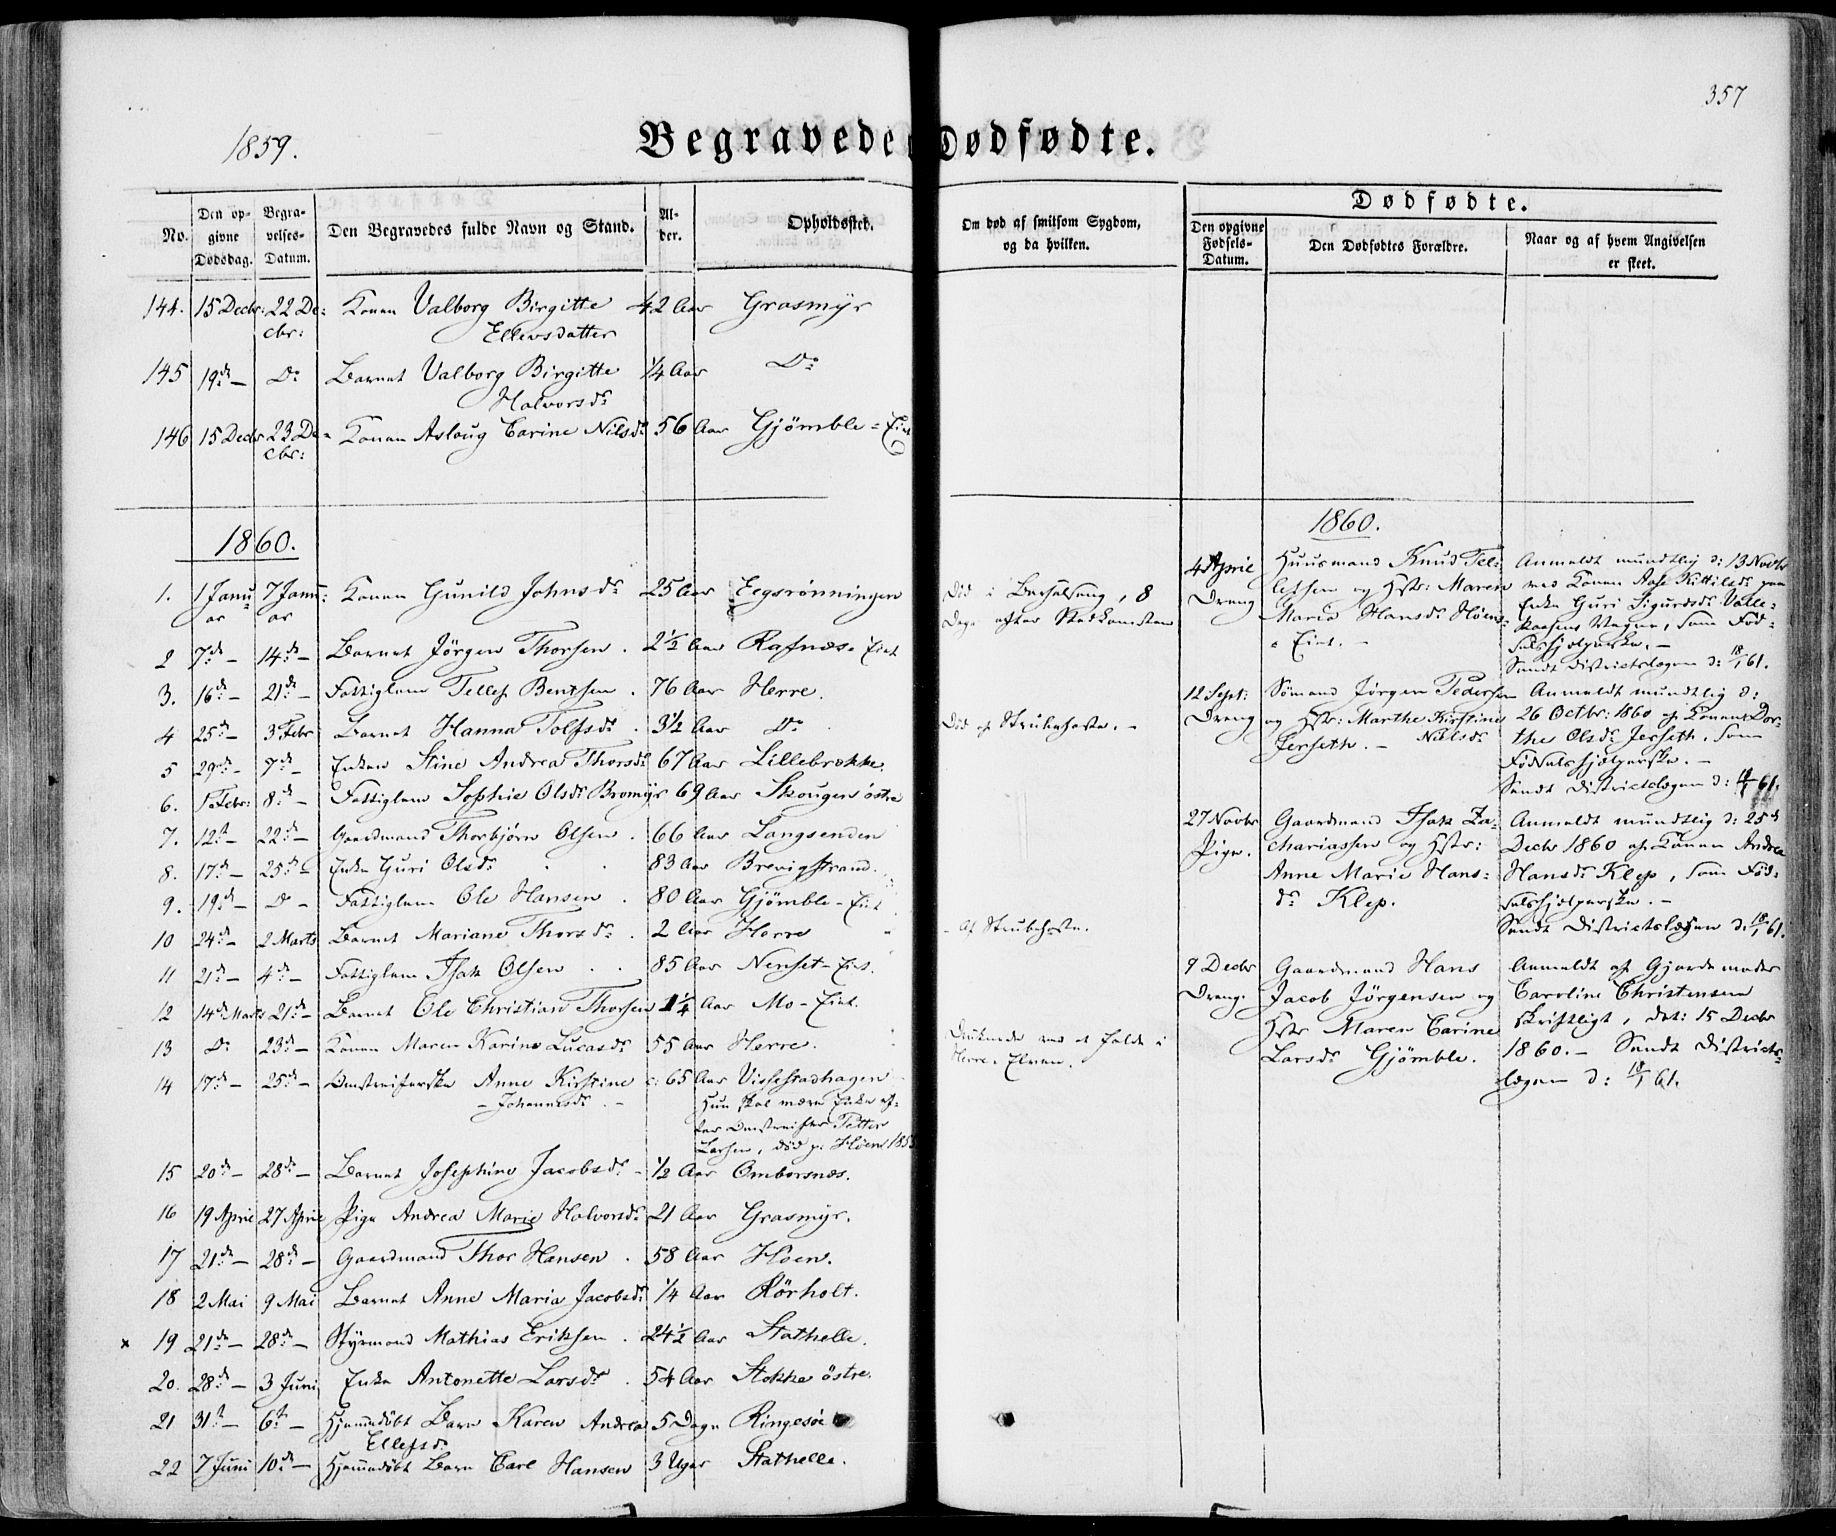 SAKO, Bamble kirkebøker, F/Fa/L0005: Ministerialbok nr. I 5, 1854-1869, s. 357